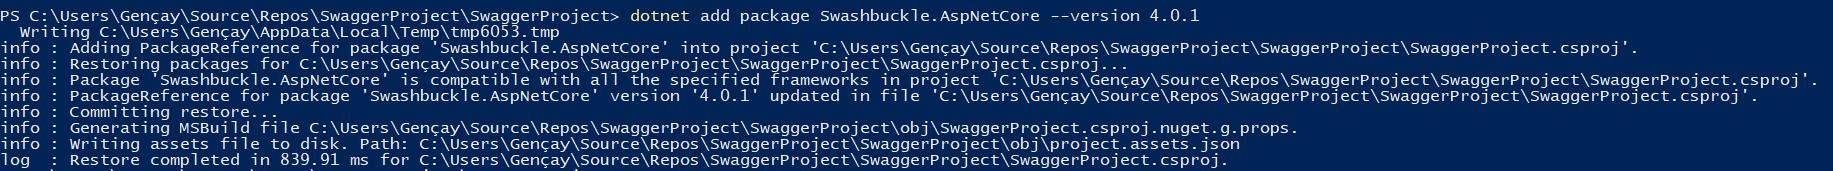 Asp.NET Core - Swagger Aracı